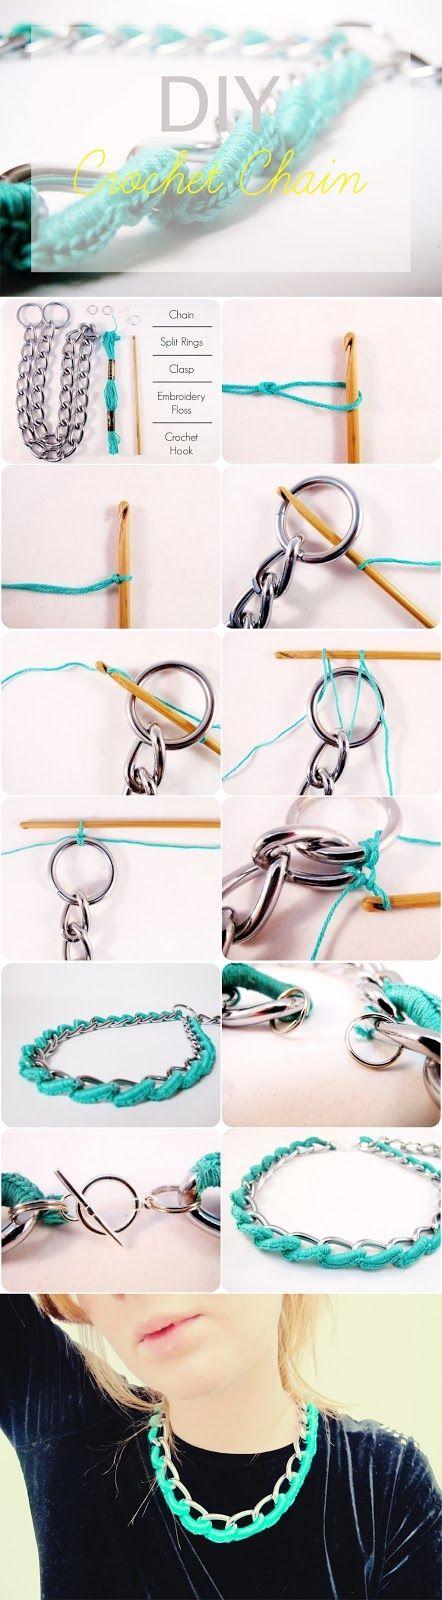 shoes shop DIY Necklace  DIY Jewelry